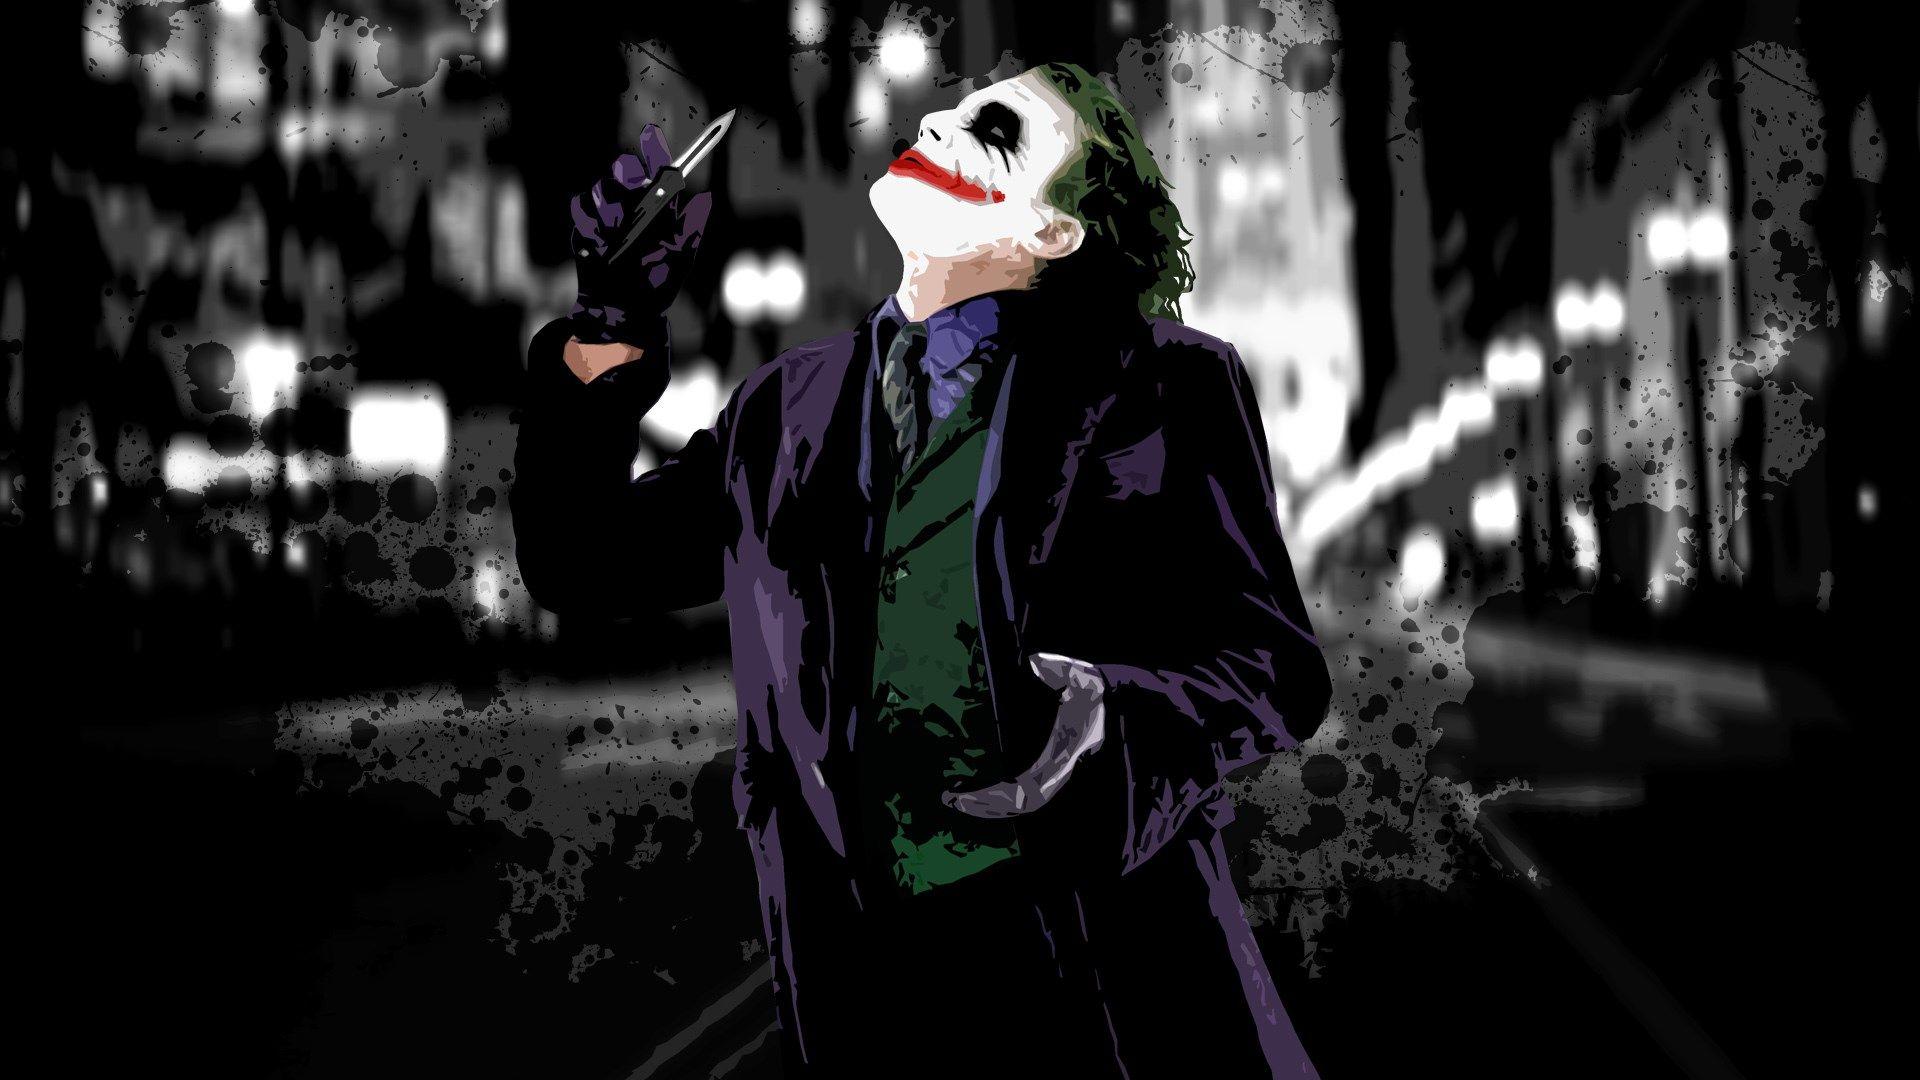 Wonderful Wallpaper Halloween Joker - dcde177de9b3affb337f82f076427f47  2018_956387.jpg